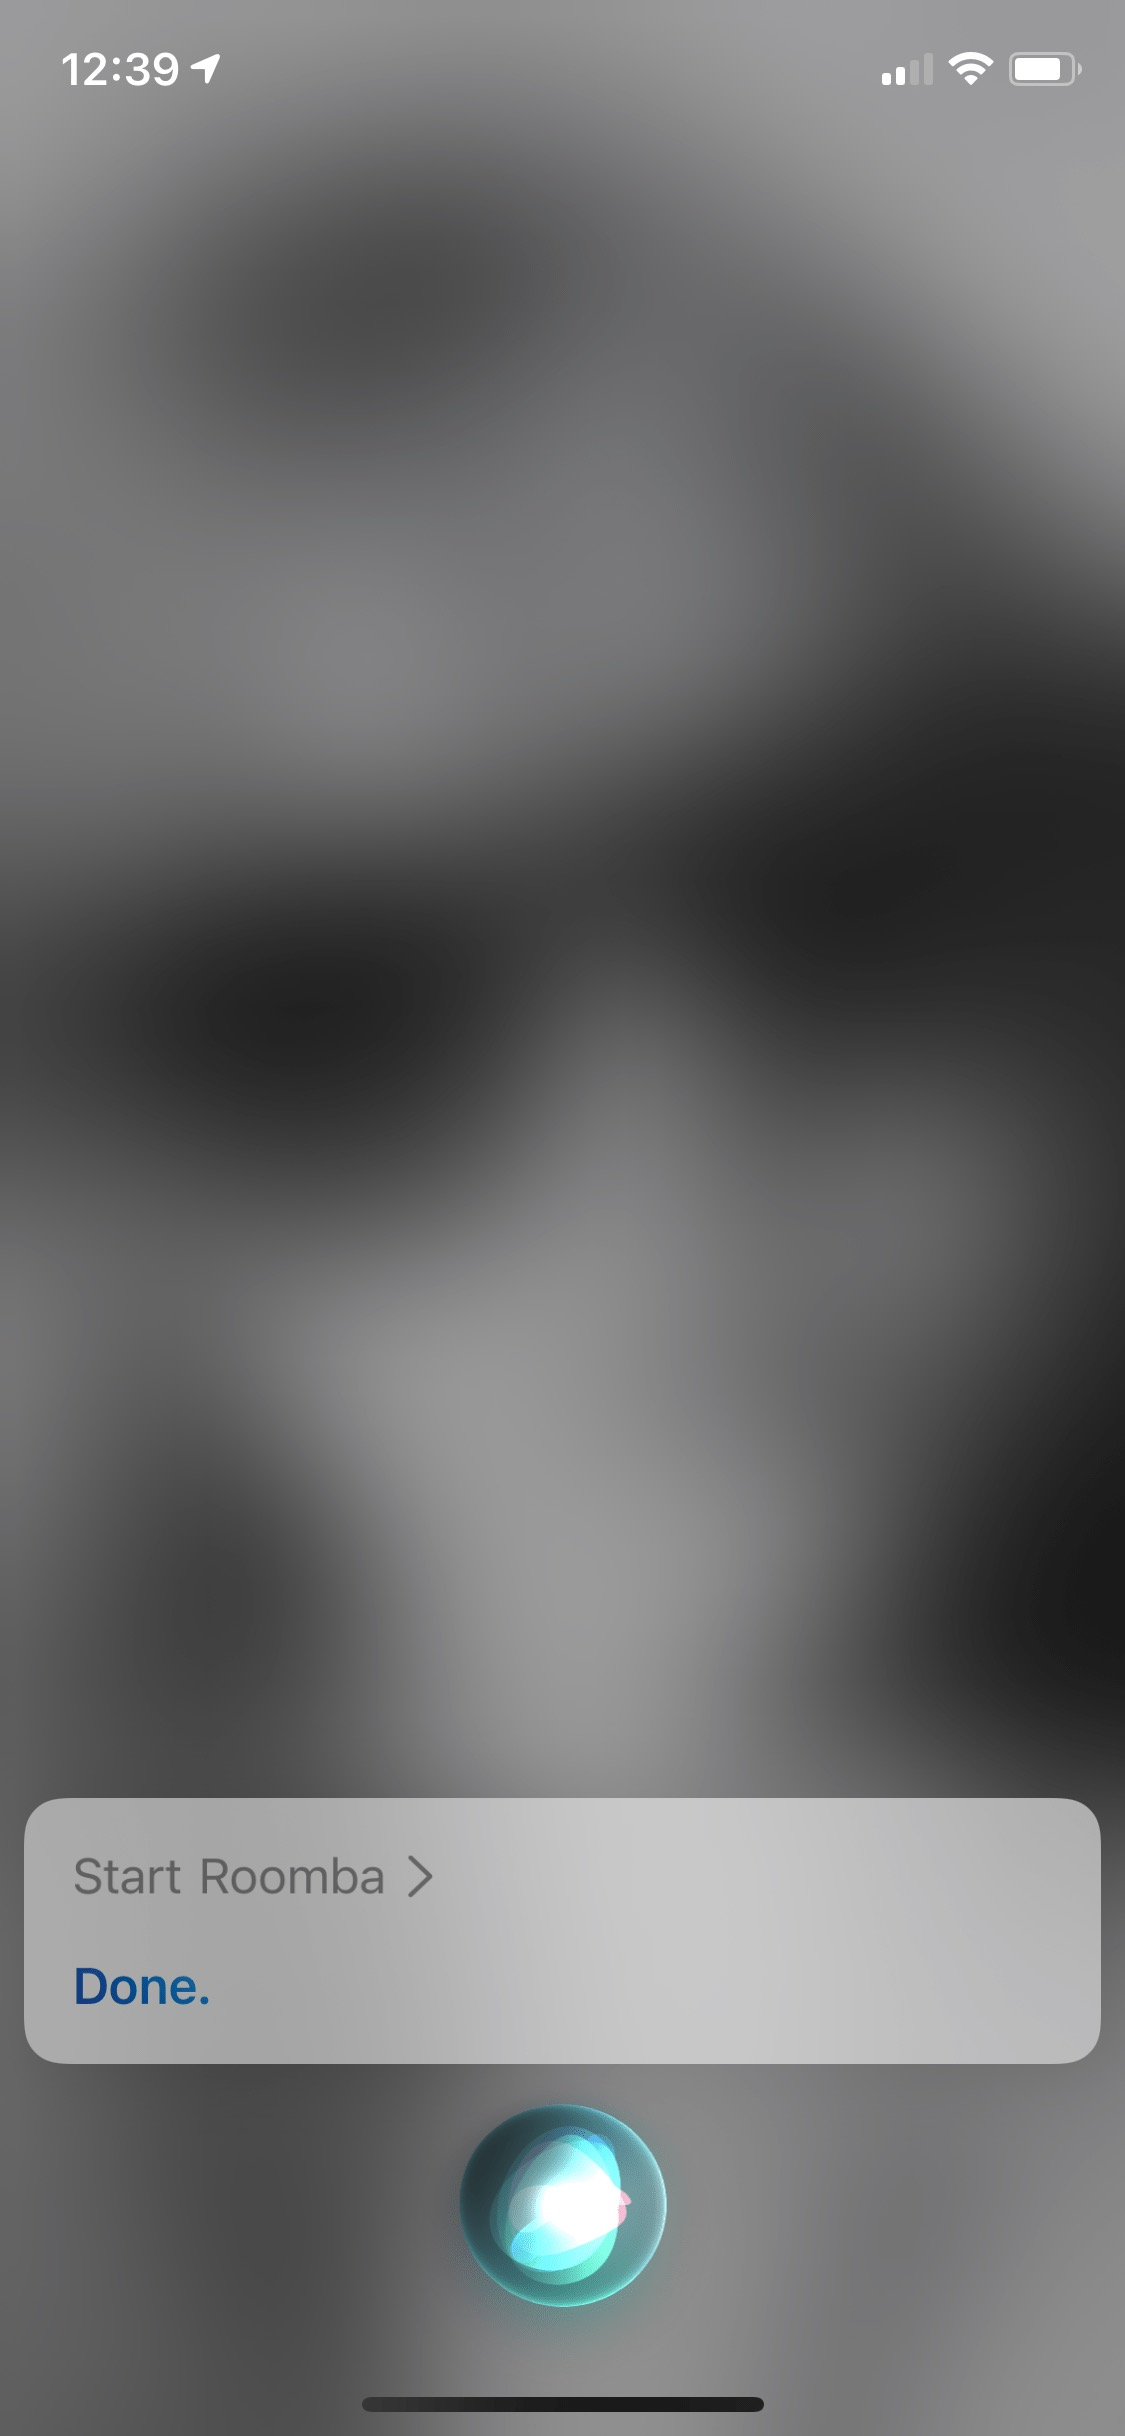 Start Roomba with Siri